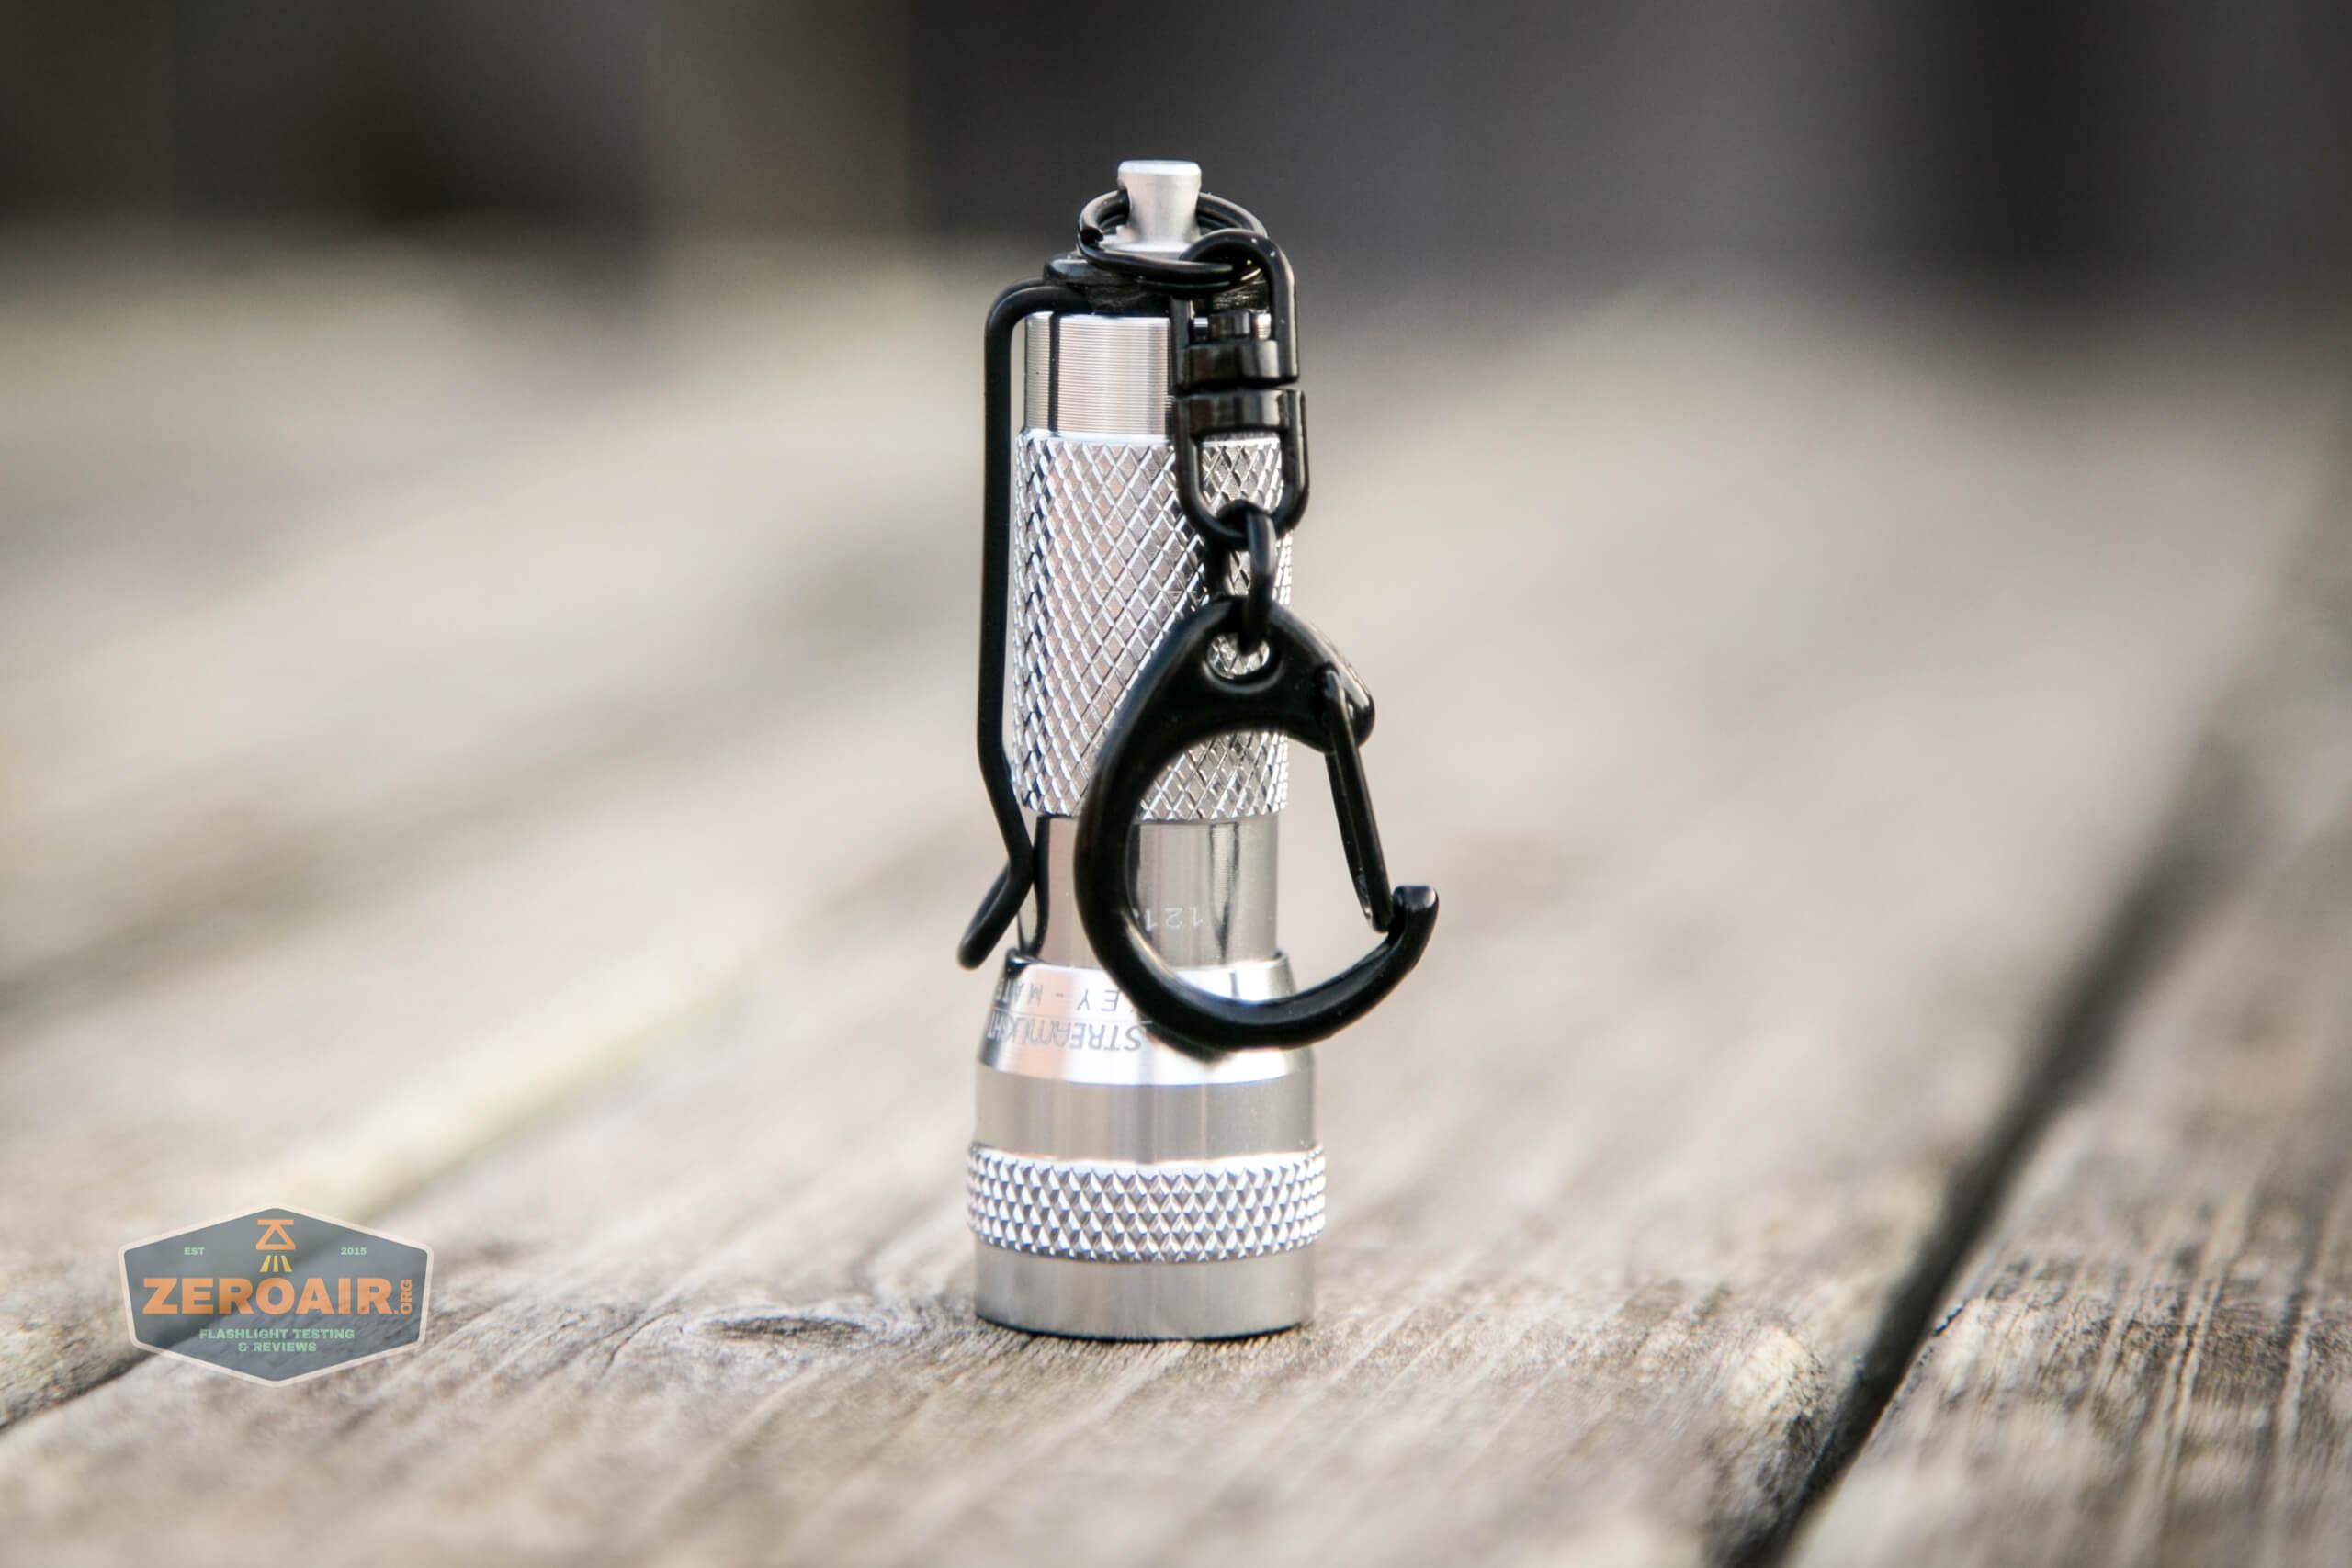 streamlight key-mate 72101 keychain twisty flashlight headstanding showing ring